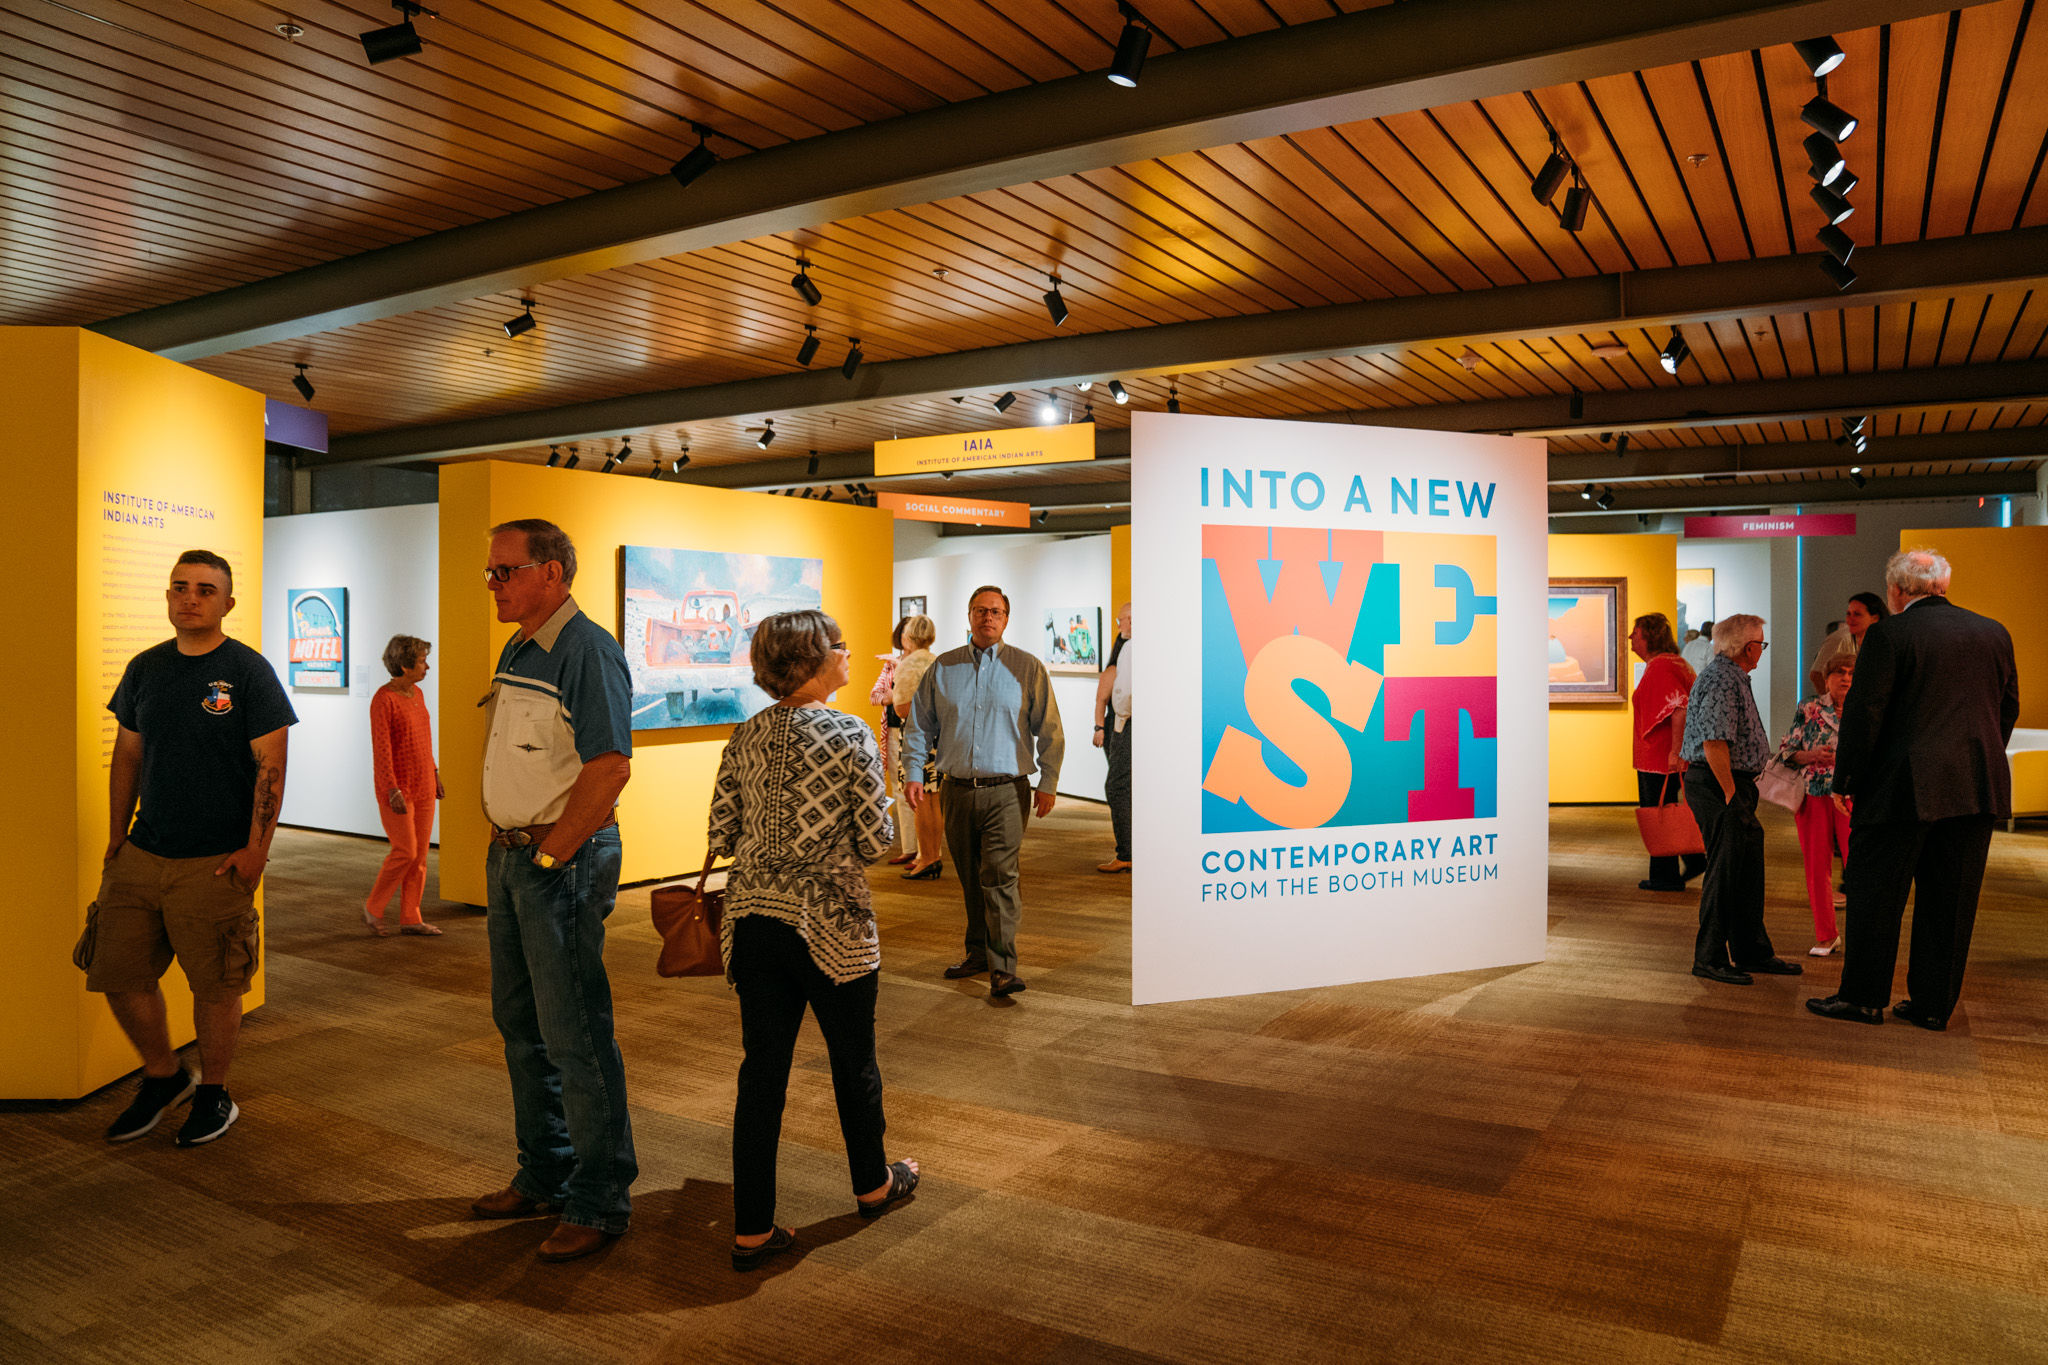 Art displayed at the Briscoe Western Art Museum